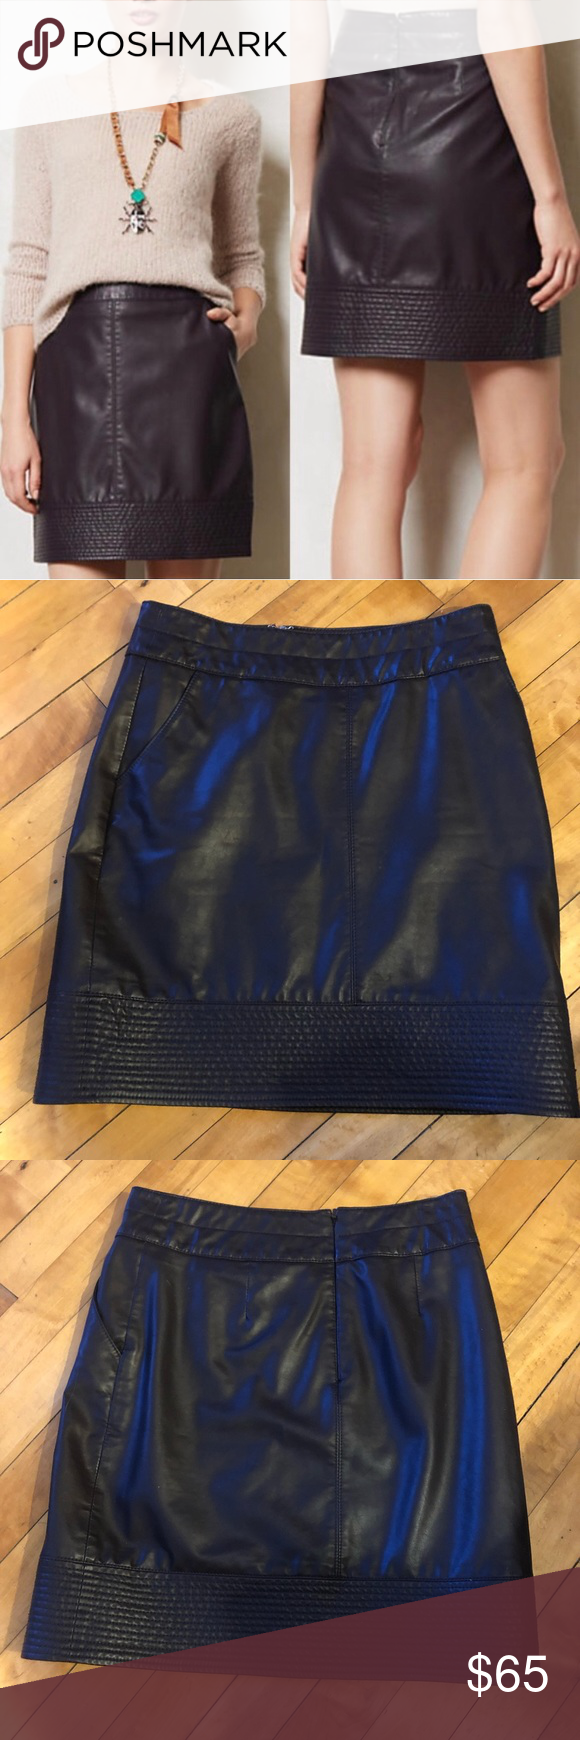 "bdaecf514e Vanessa and Virginia vegan leather skirt plum Vegan ""leather""skirt by  Vanessa & Virginia Size 0 Zipper closure in back 2 pockets 14"" across  waist, ..."